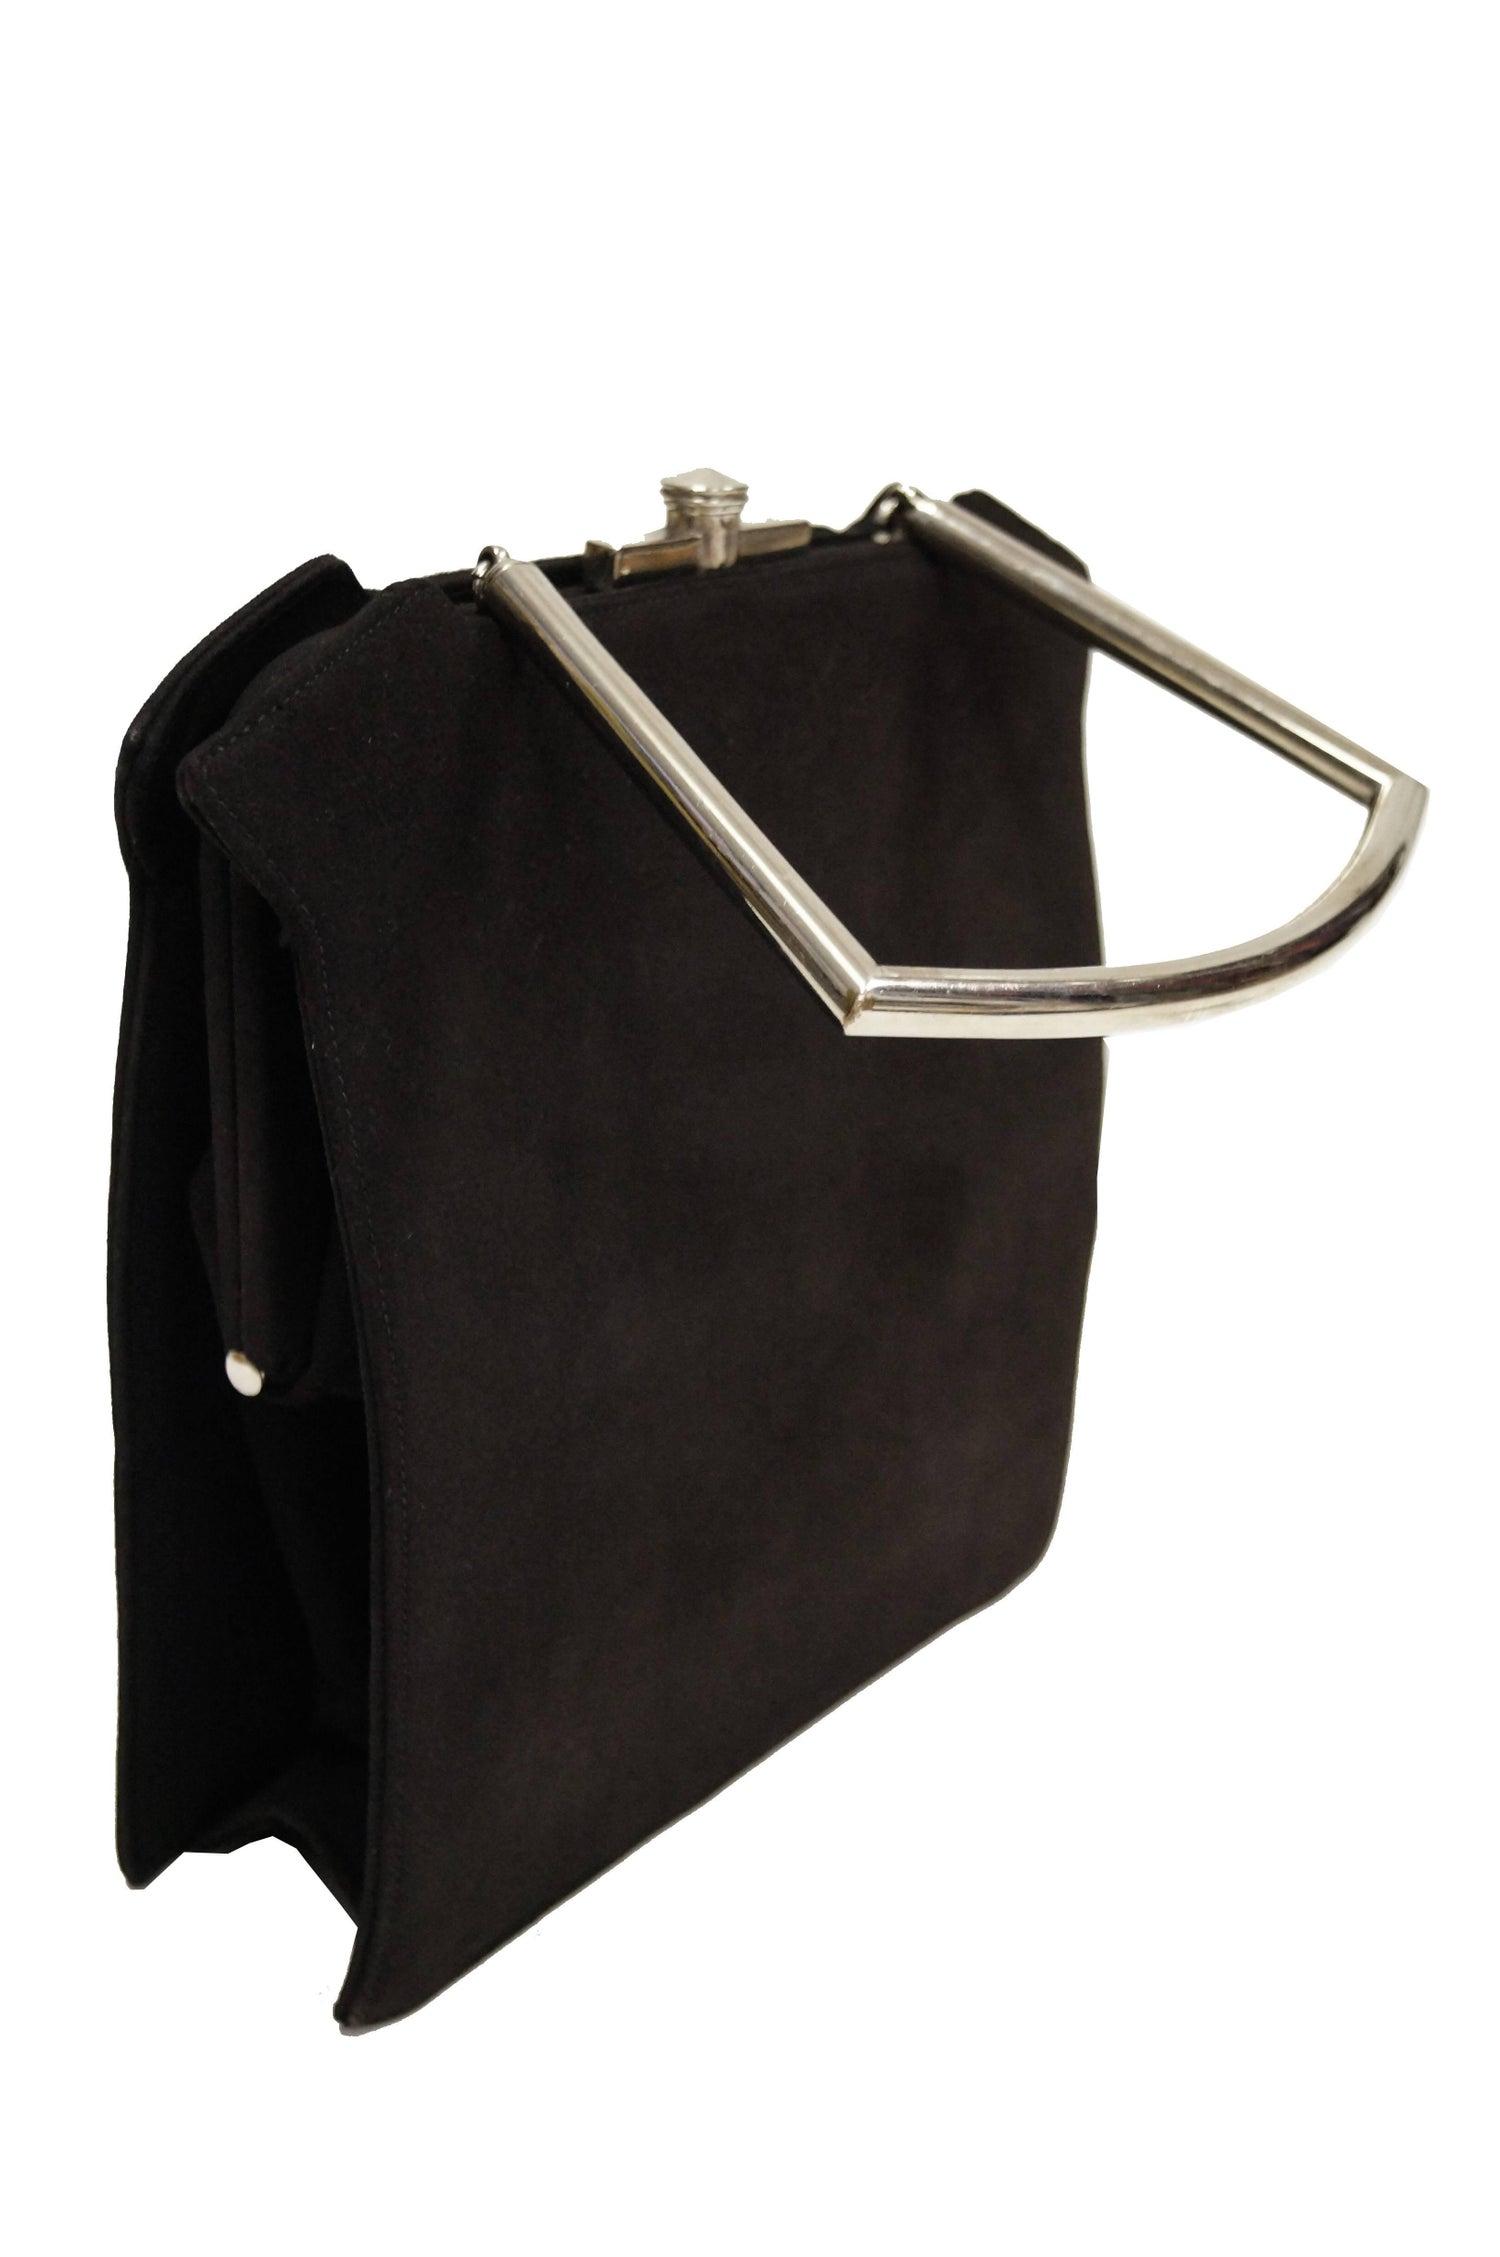 Eisenberg Rare 1940s Eisenberg Rhinestone Black Ultra Suede Handbag 6SO9Y